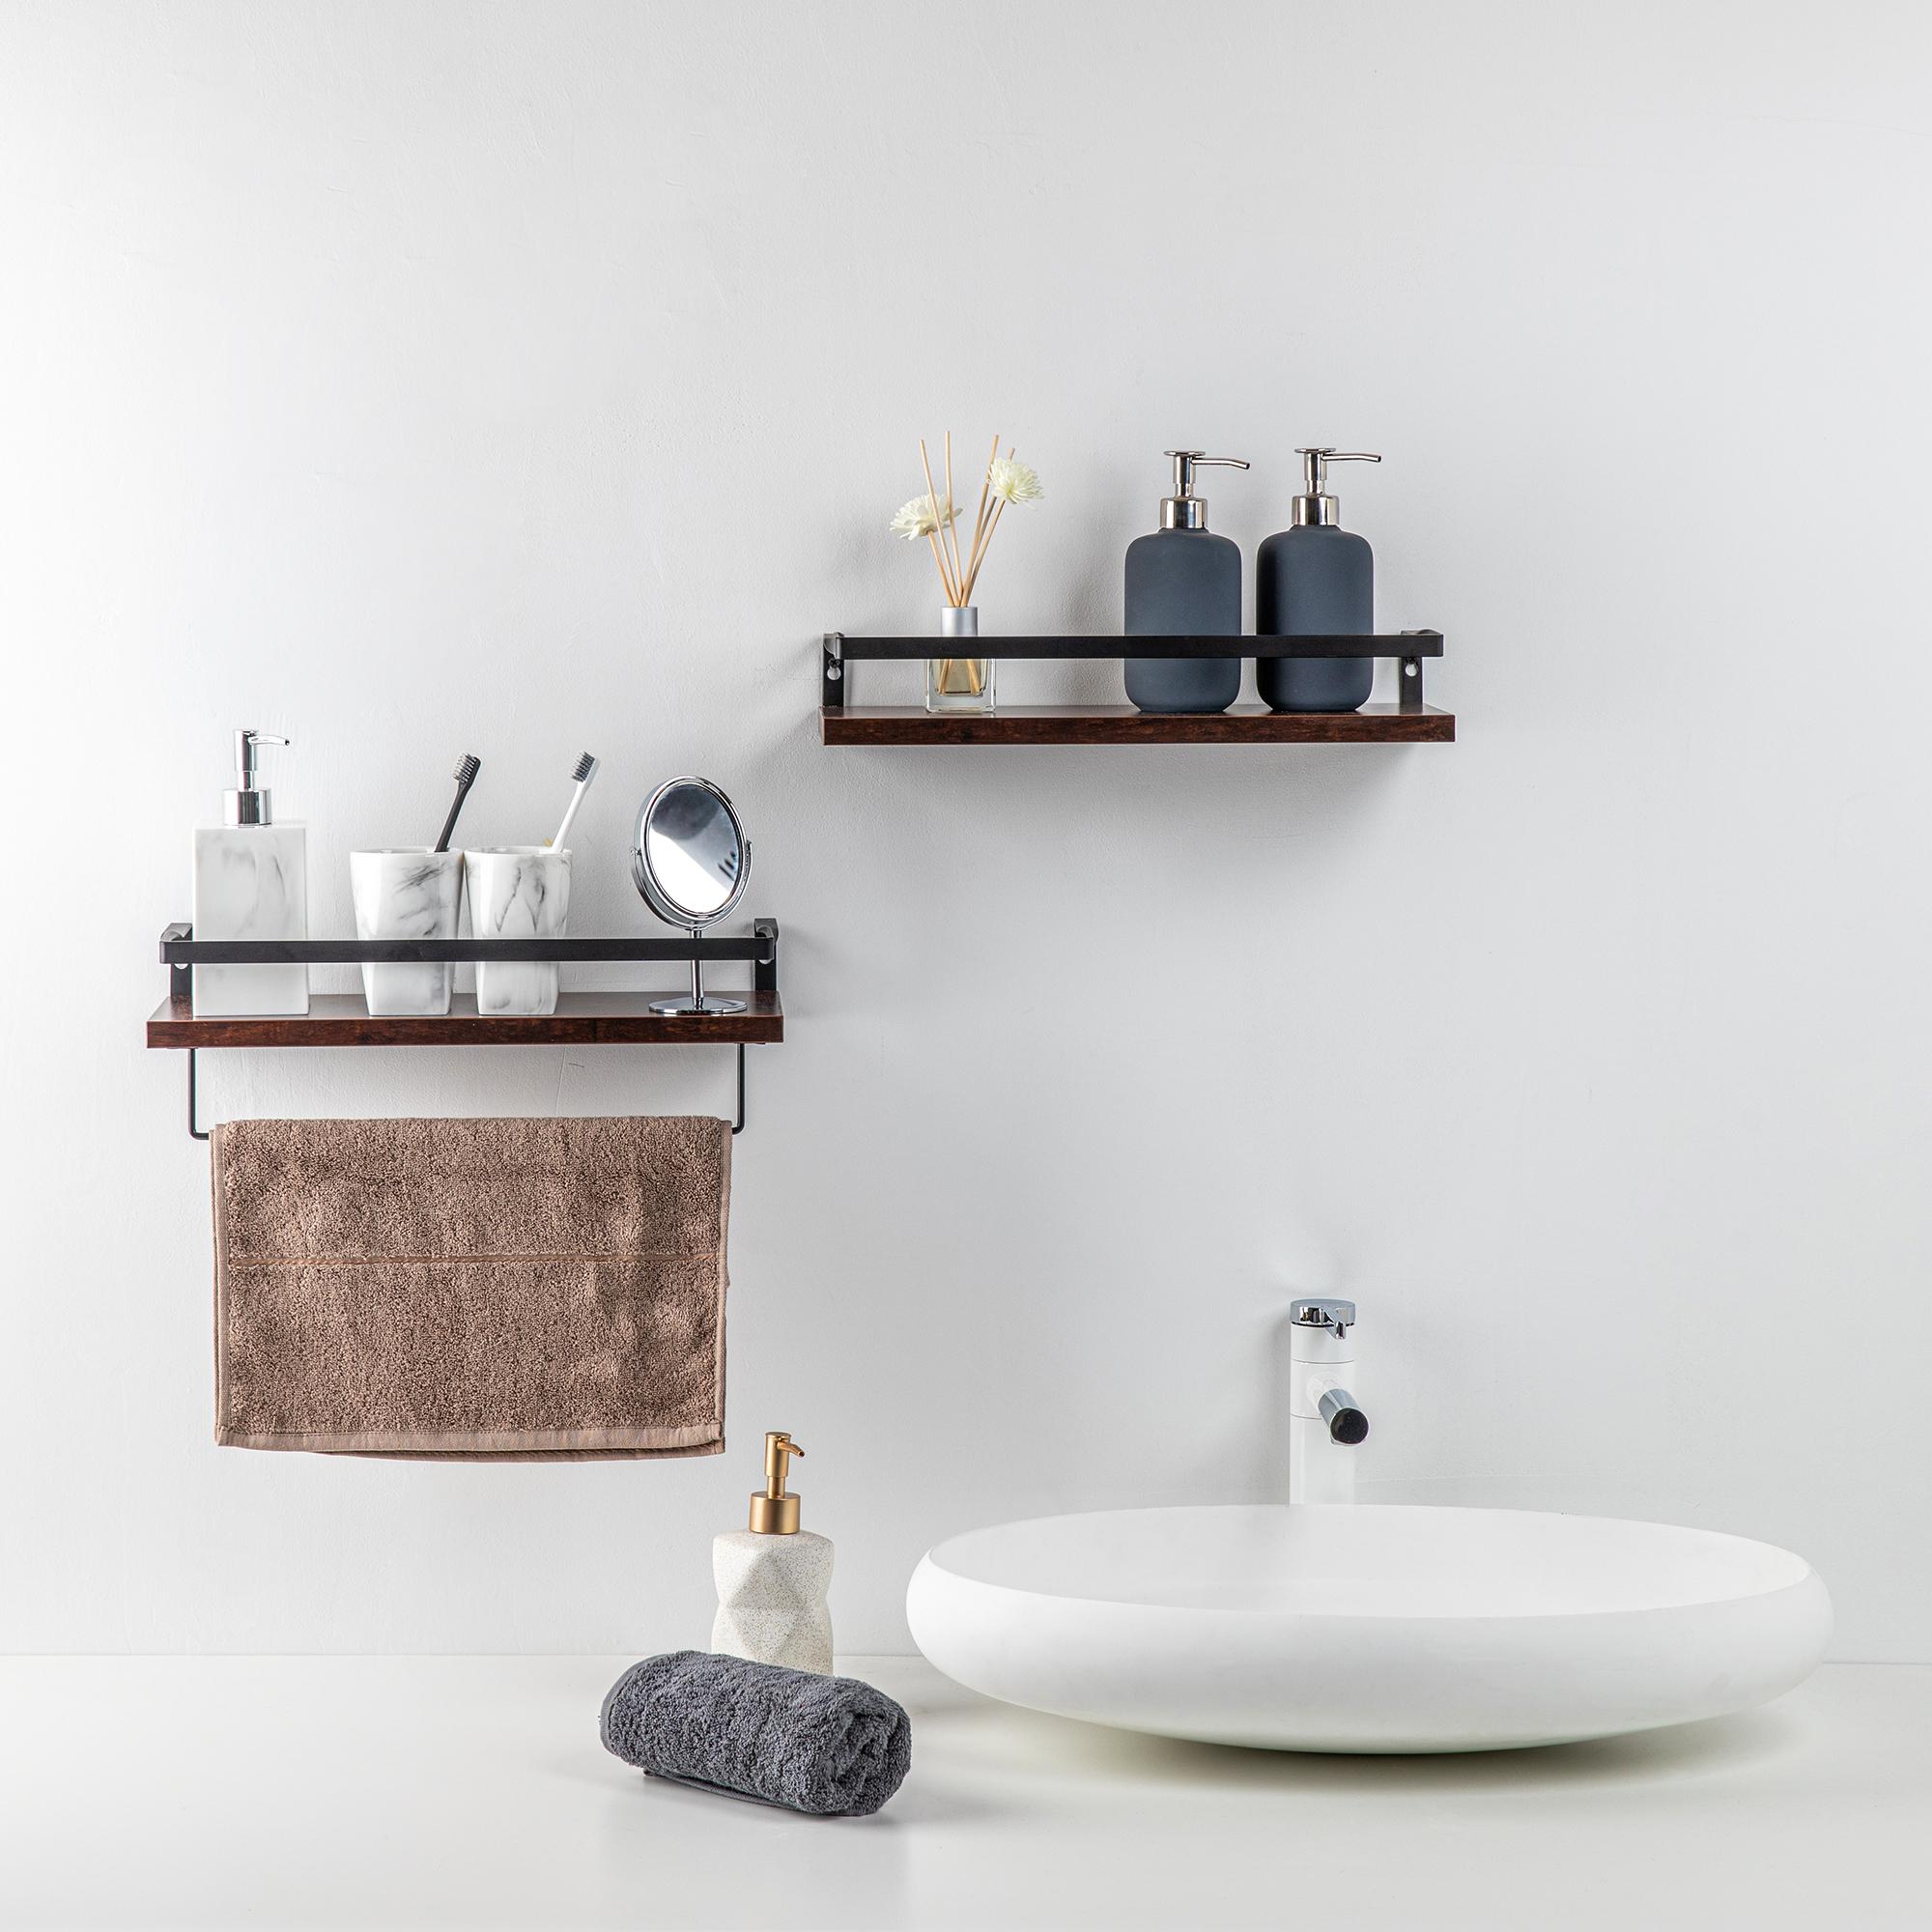 Set of 2 Rustic wood Storage hanging display Shelf Racks Wall Mounted wooden Floating Shelves For Kitchen Bathroom Bedroom